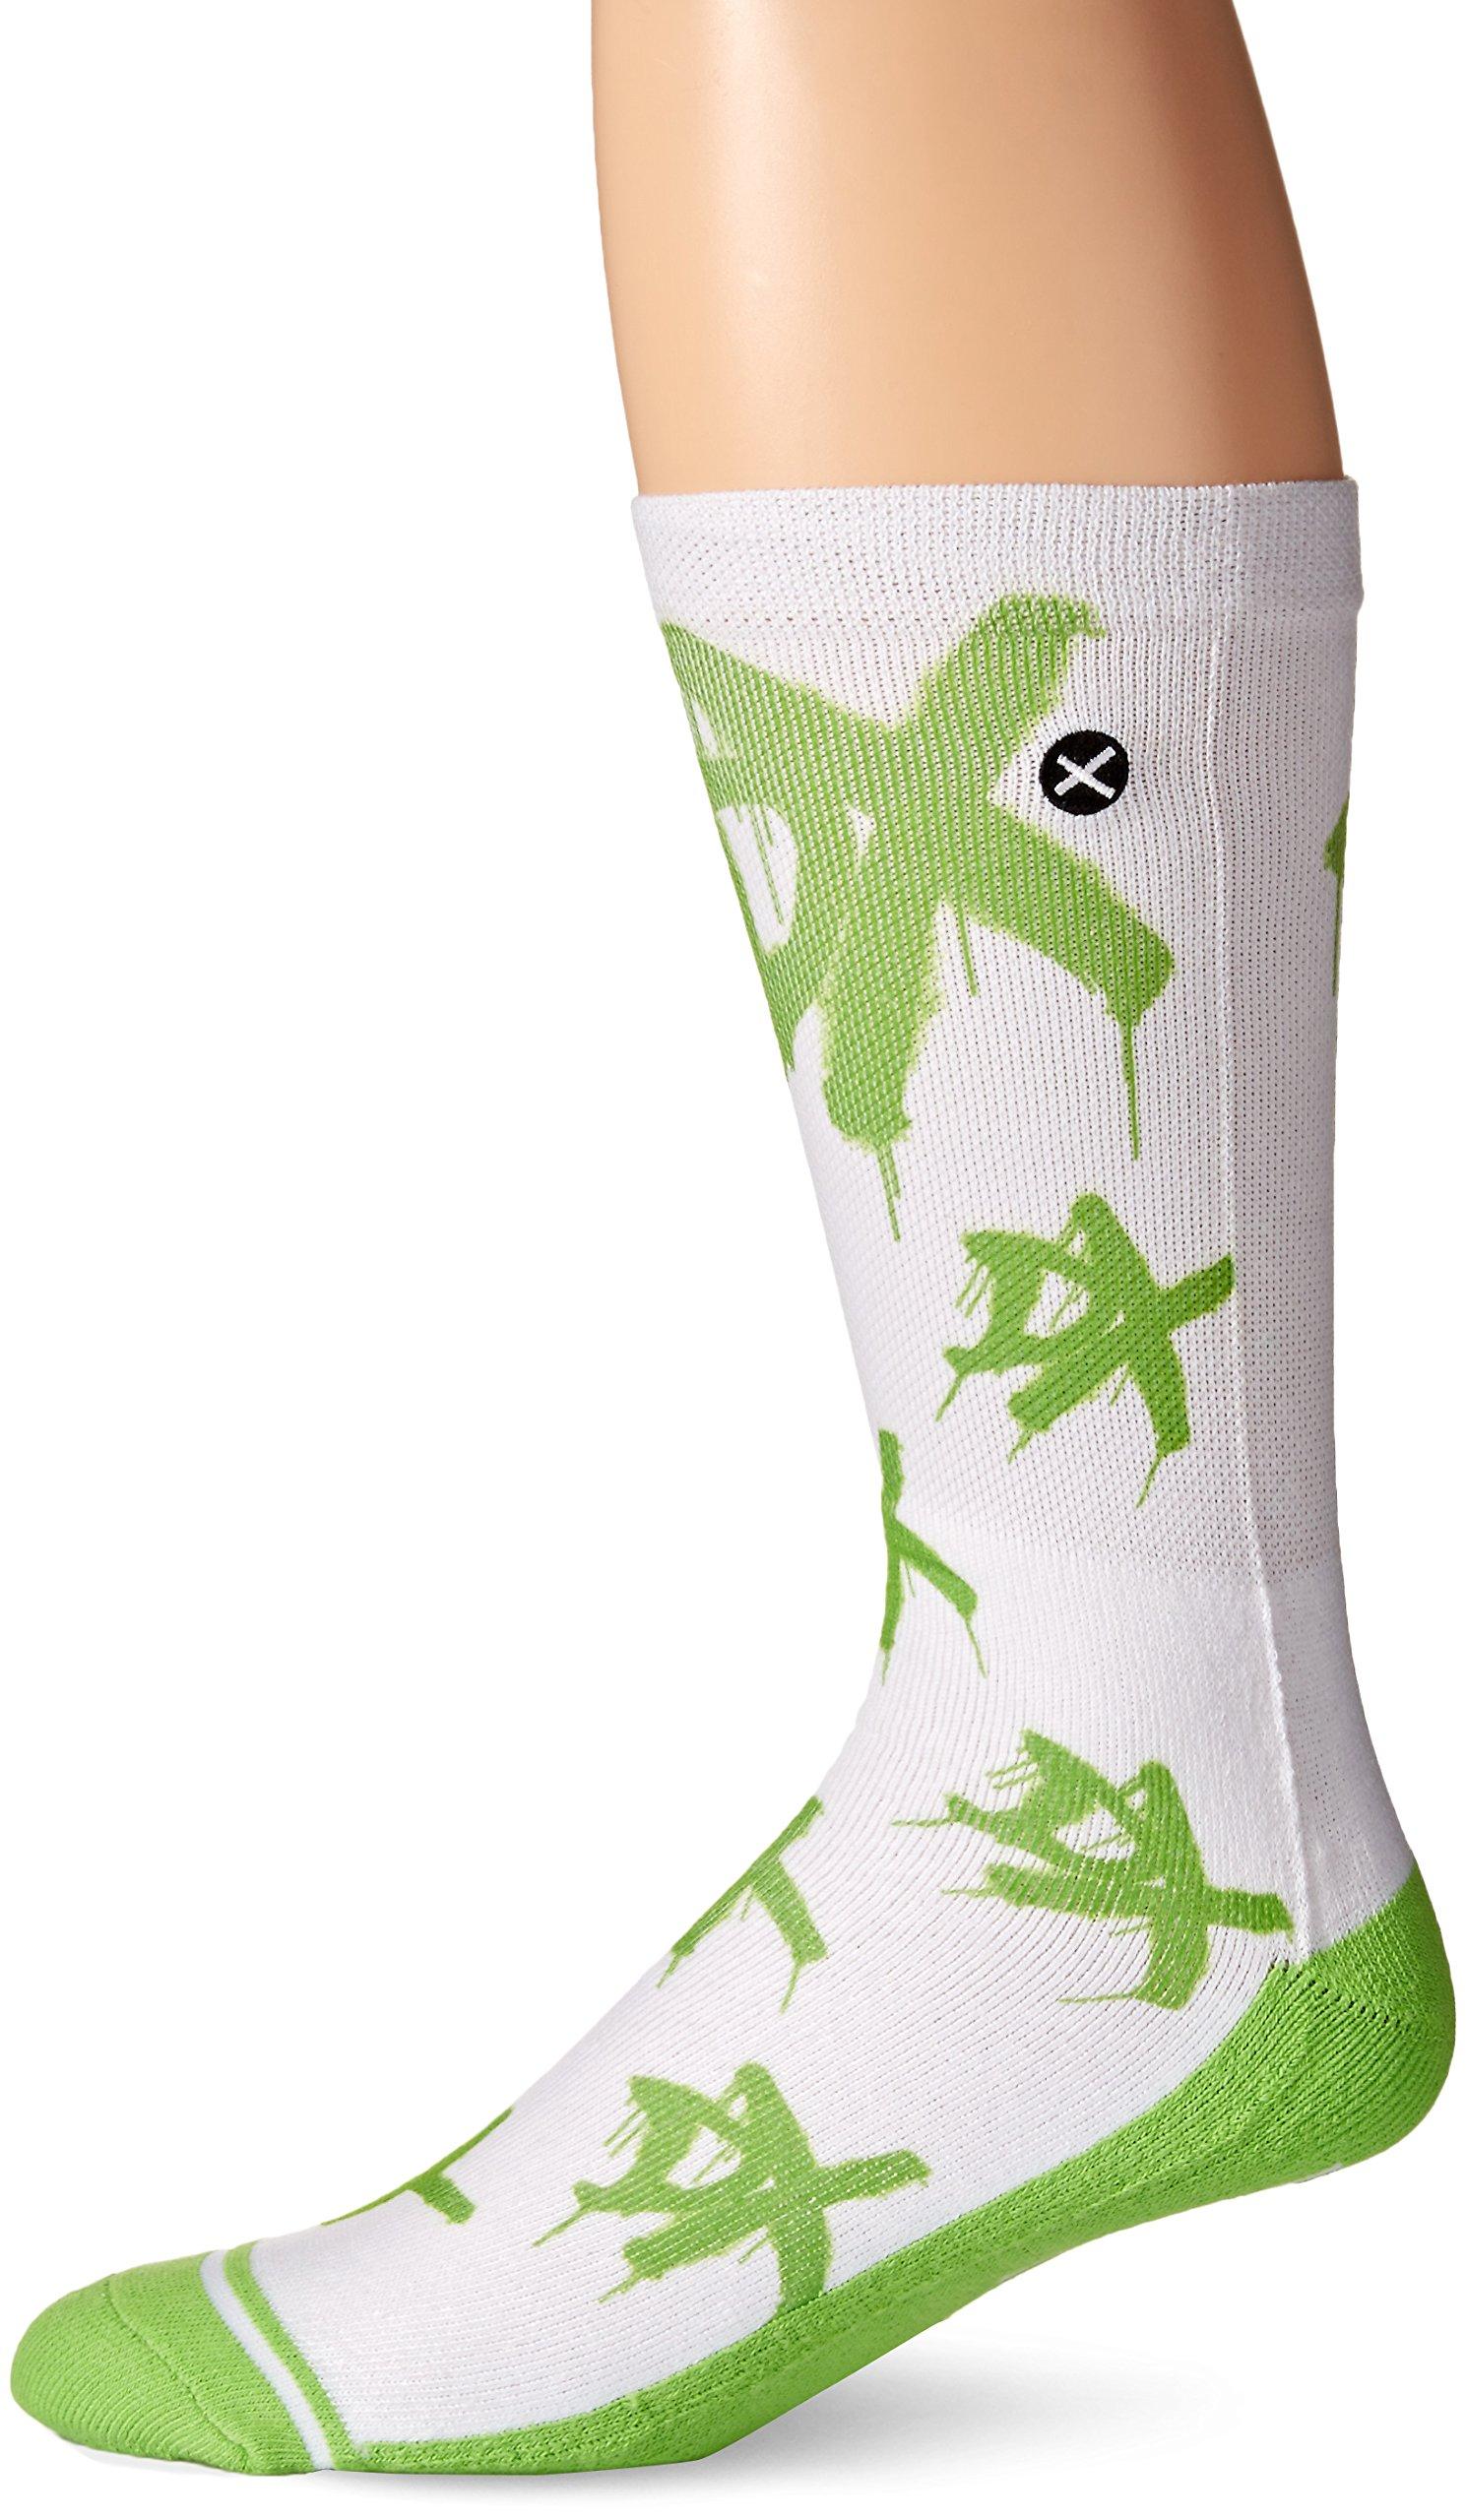 Odd Sox Men's DX, Multi, Sock Size:10-13/Shoe Size: 6-12